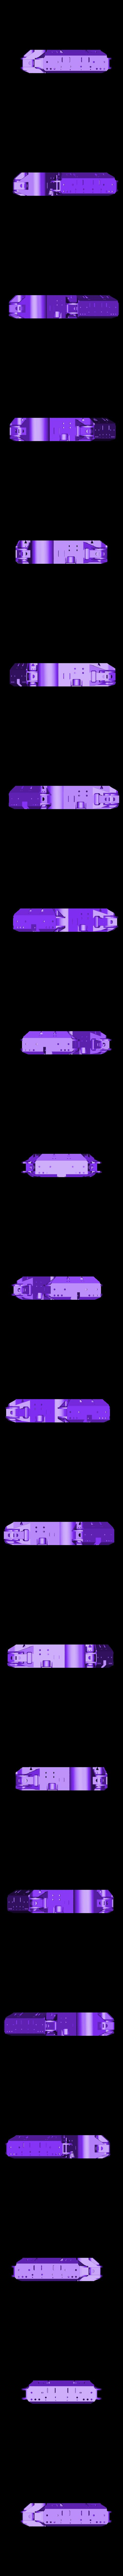 base (1pcs).STL Download STL file Folding Quadcopter 450 Frame • 3D print object, AleksandrDolzhenko